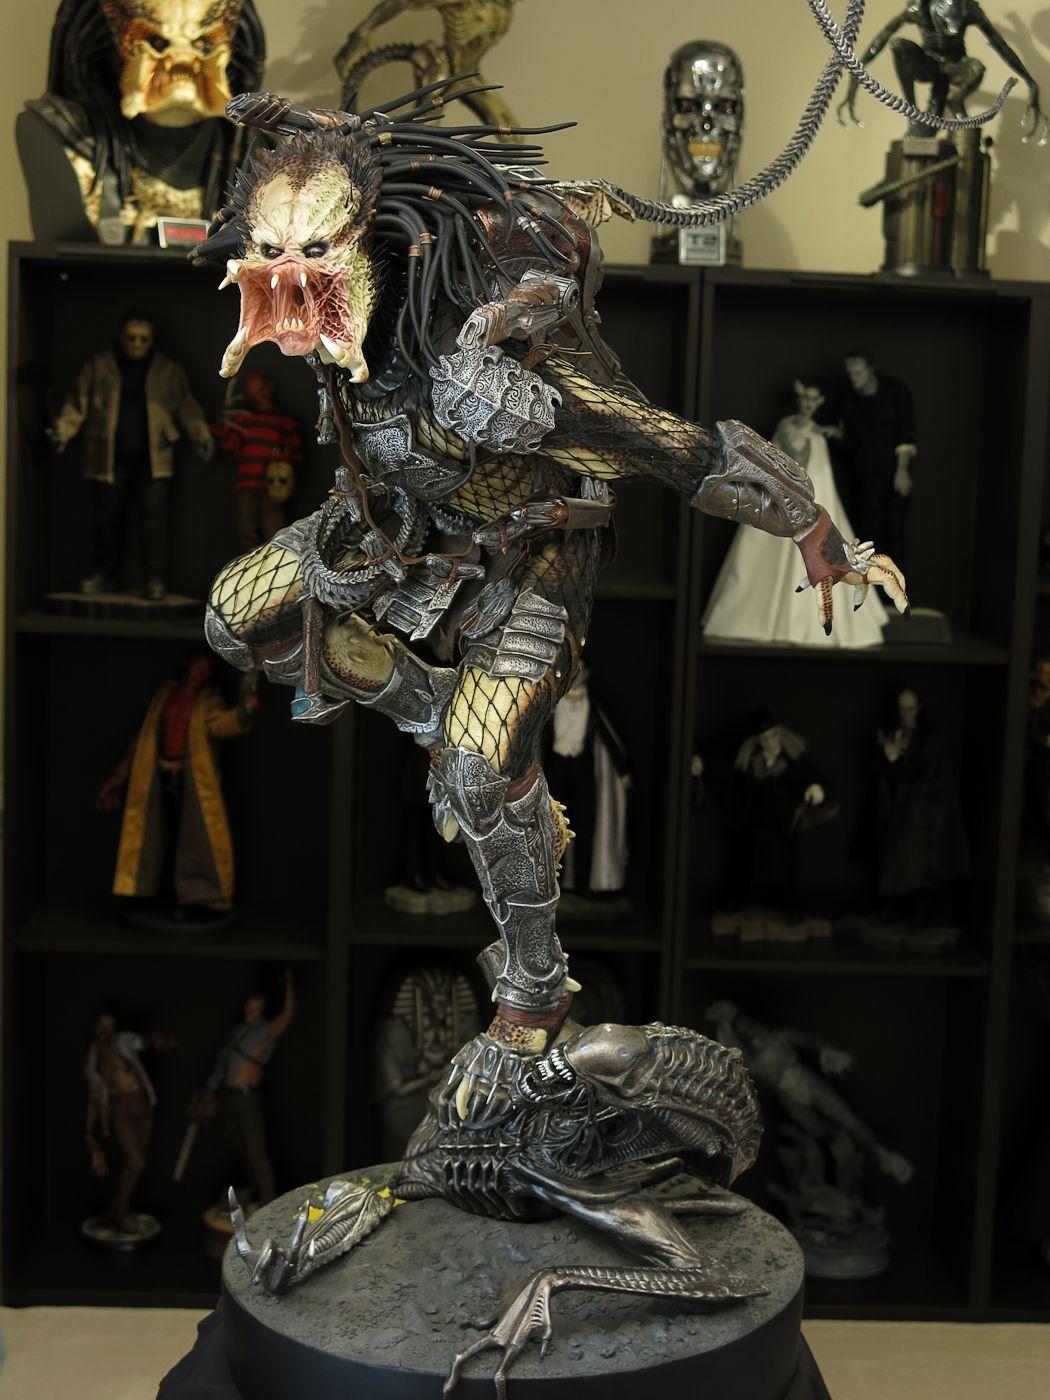 ALIENS VS PREDATORS: WOLF PREDATOR Legendary scale figure 9